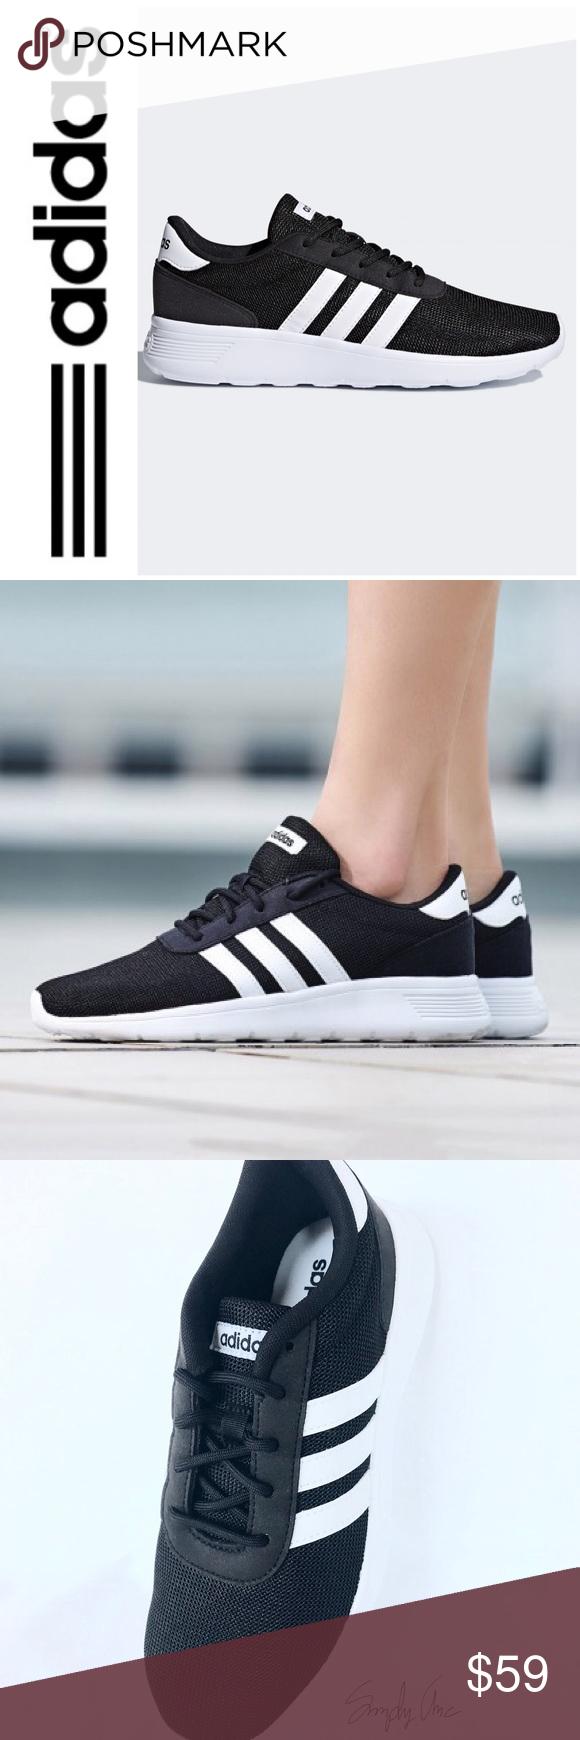 New Adidas lite race shoes black white